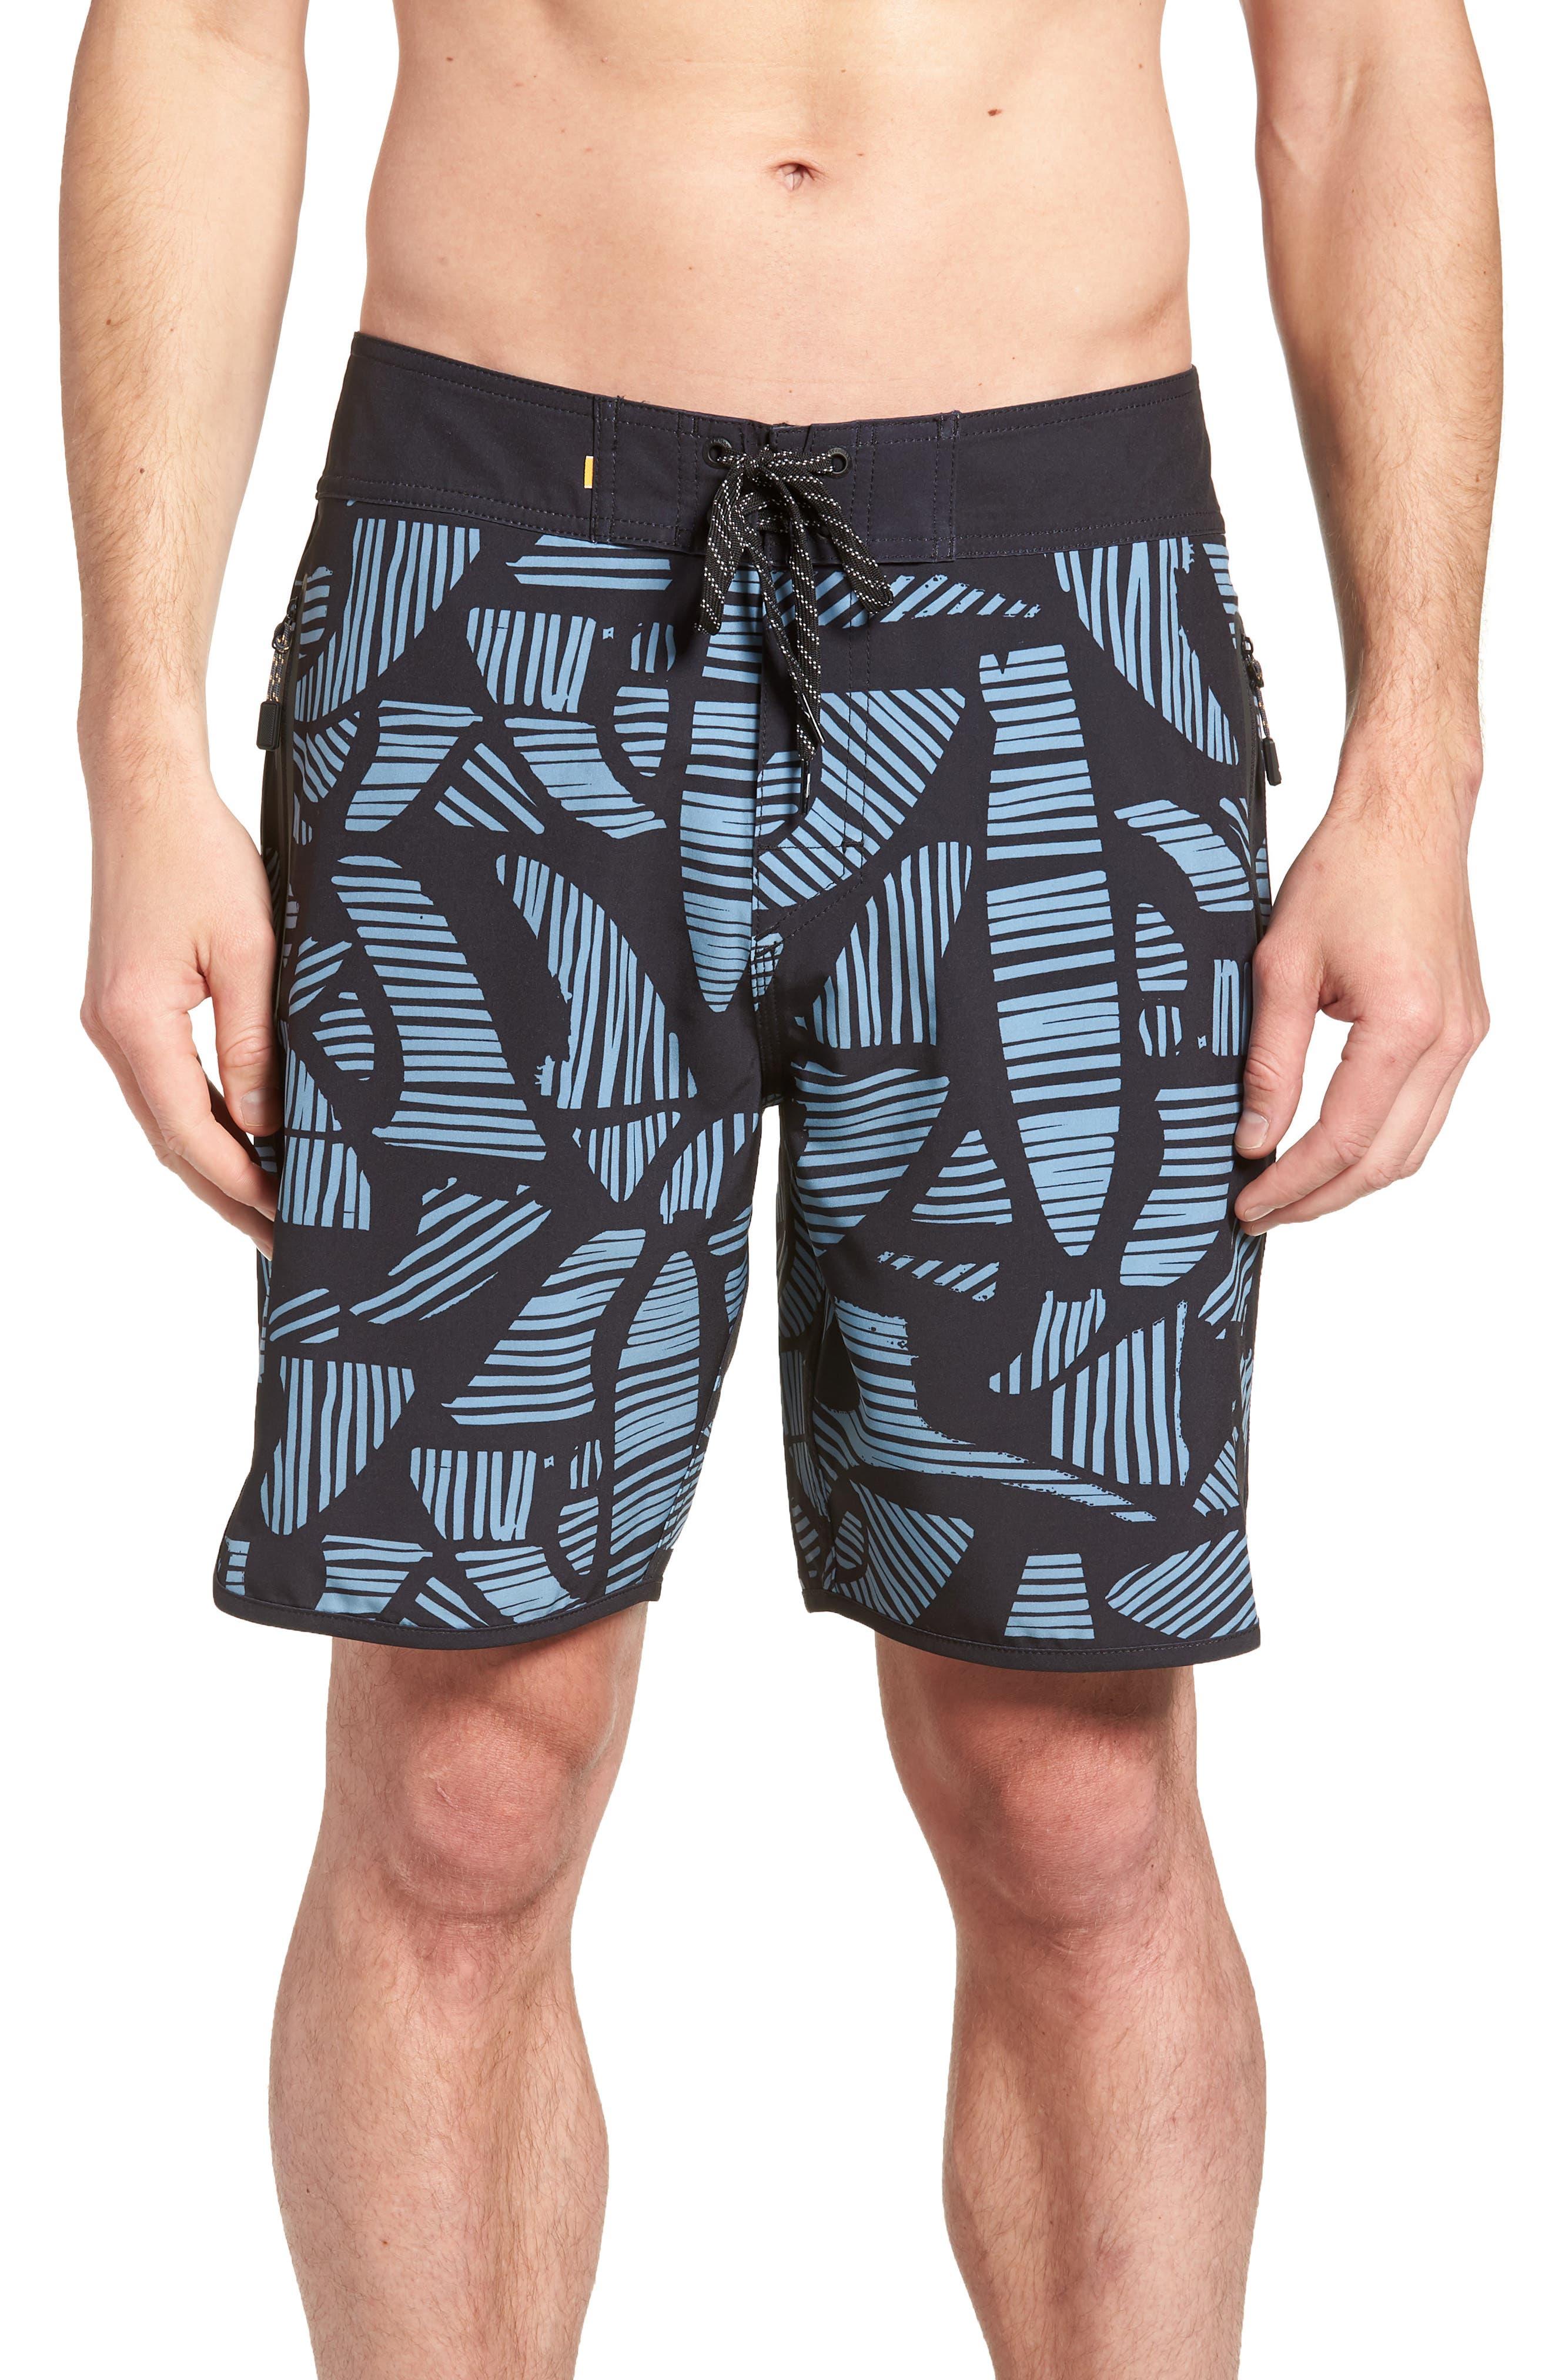 Odysea Board Shorts,                         Main,                         color, Black